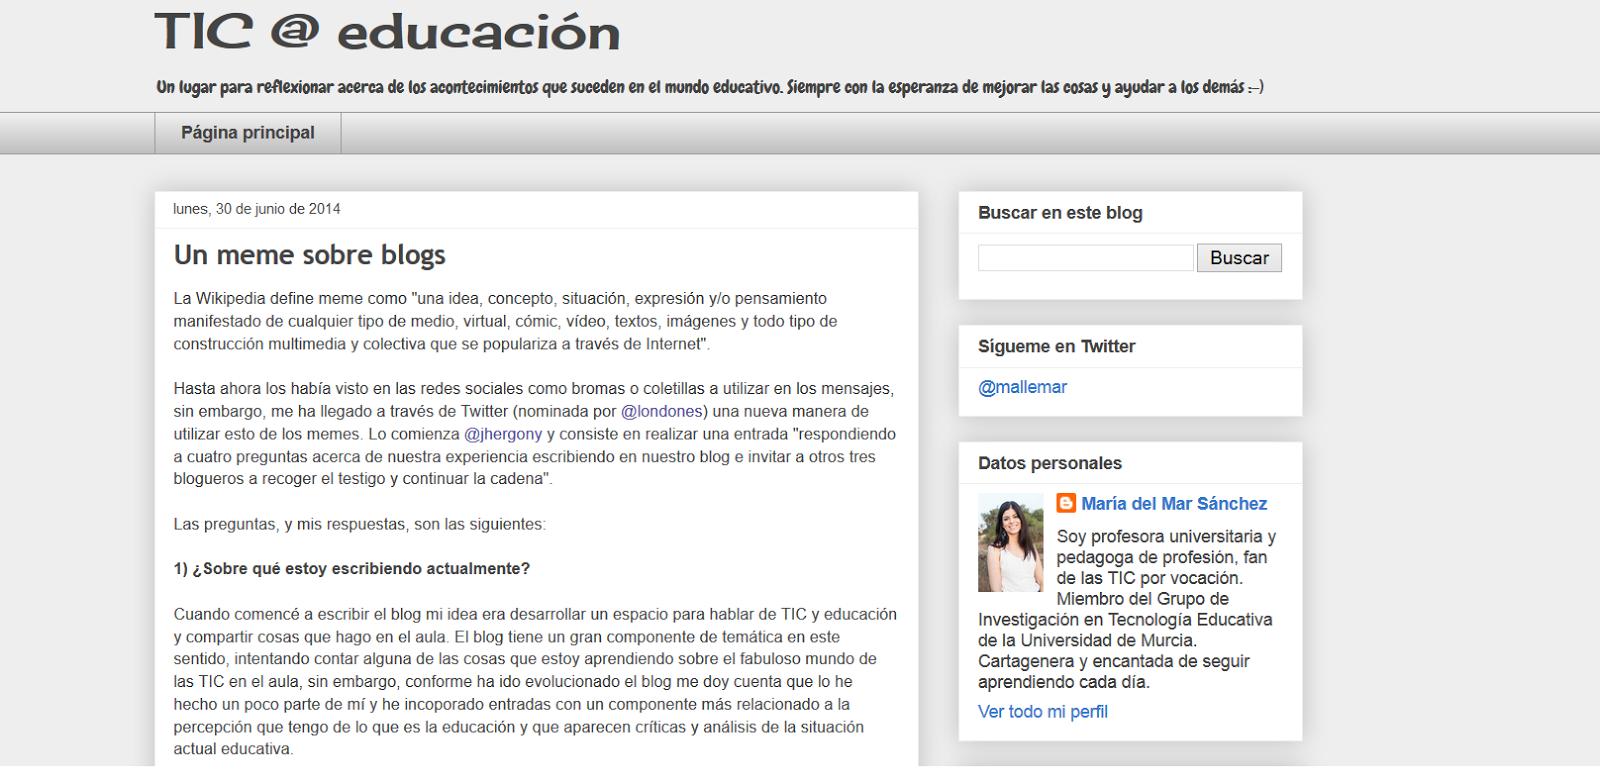 http://marsanchezvera.blogspot.com.es/2014/06/un-meme-sobre-blogs.html?spref=tw